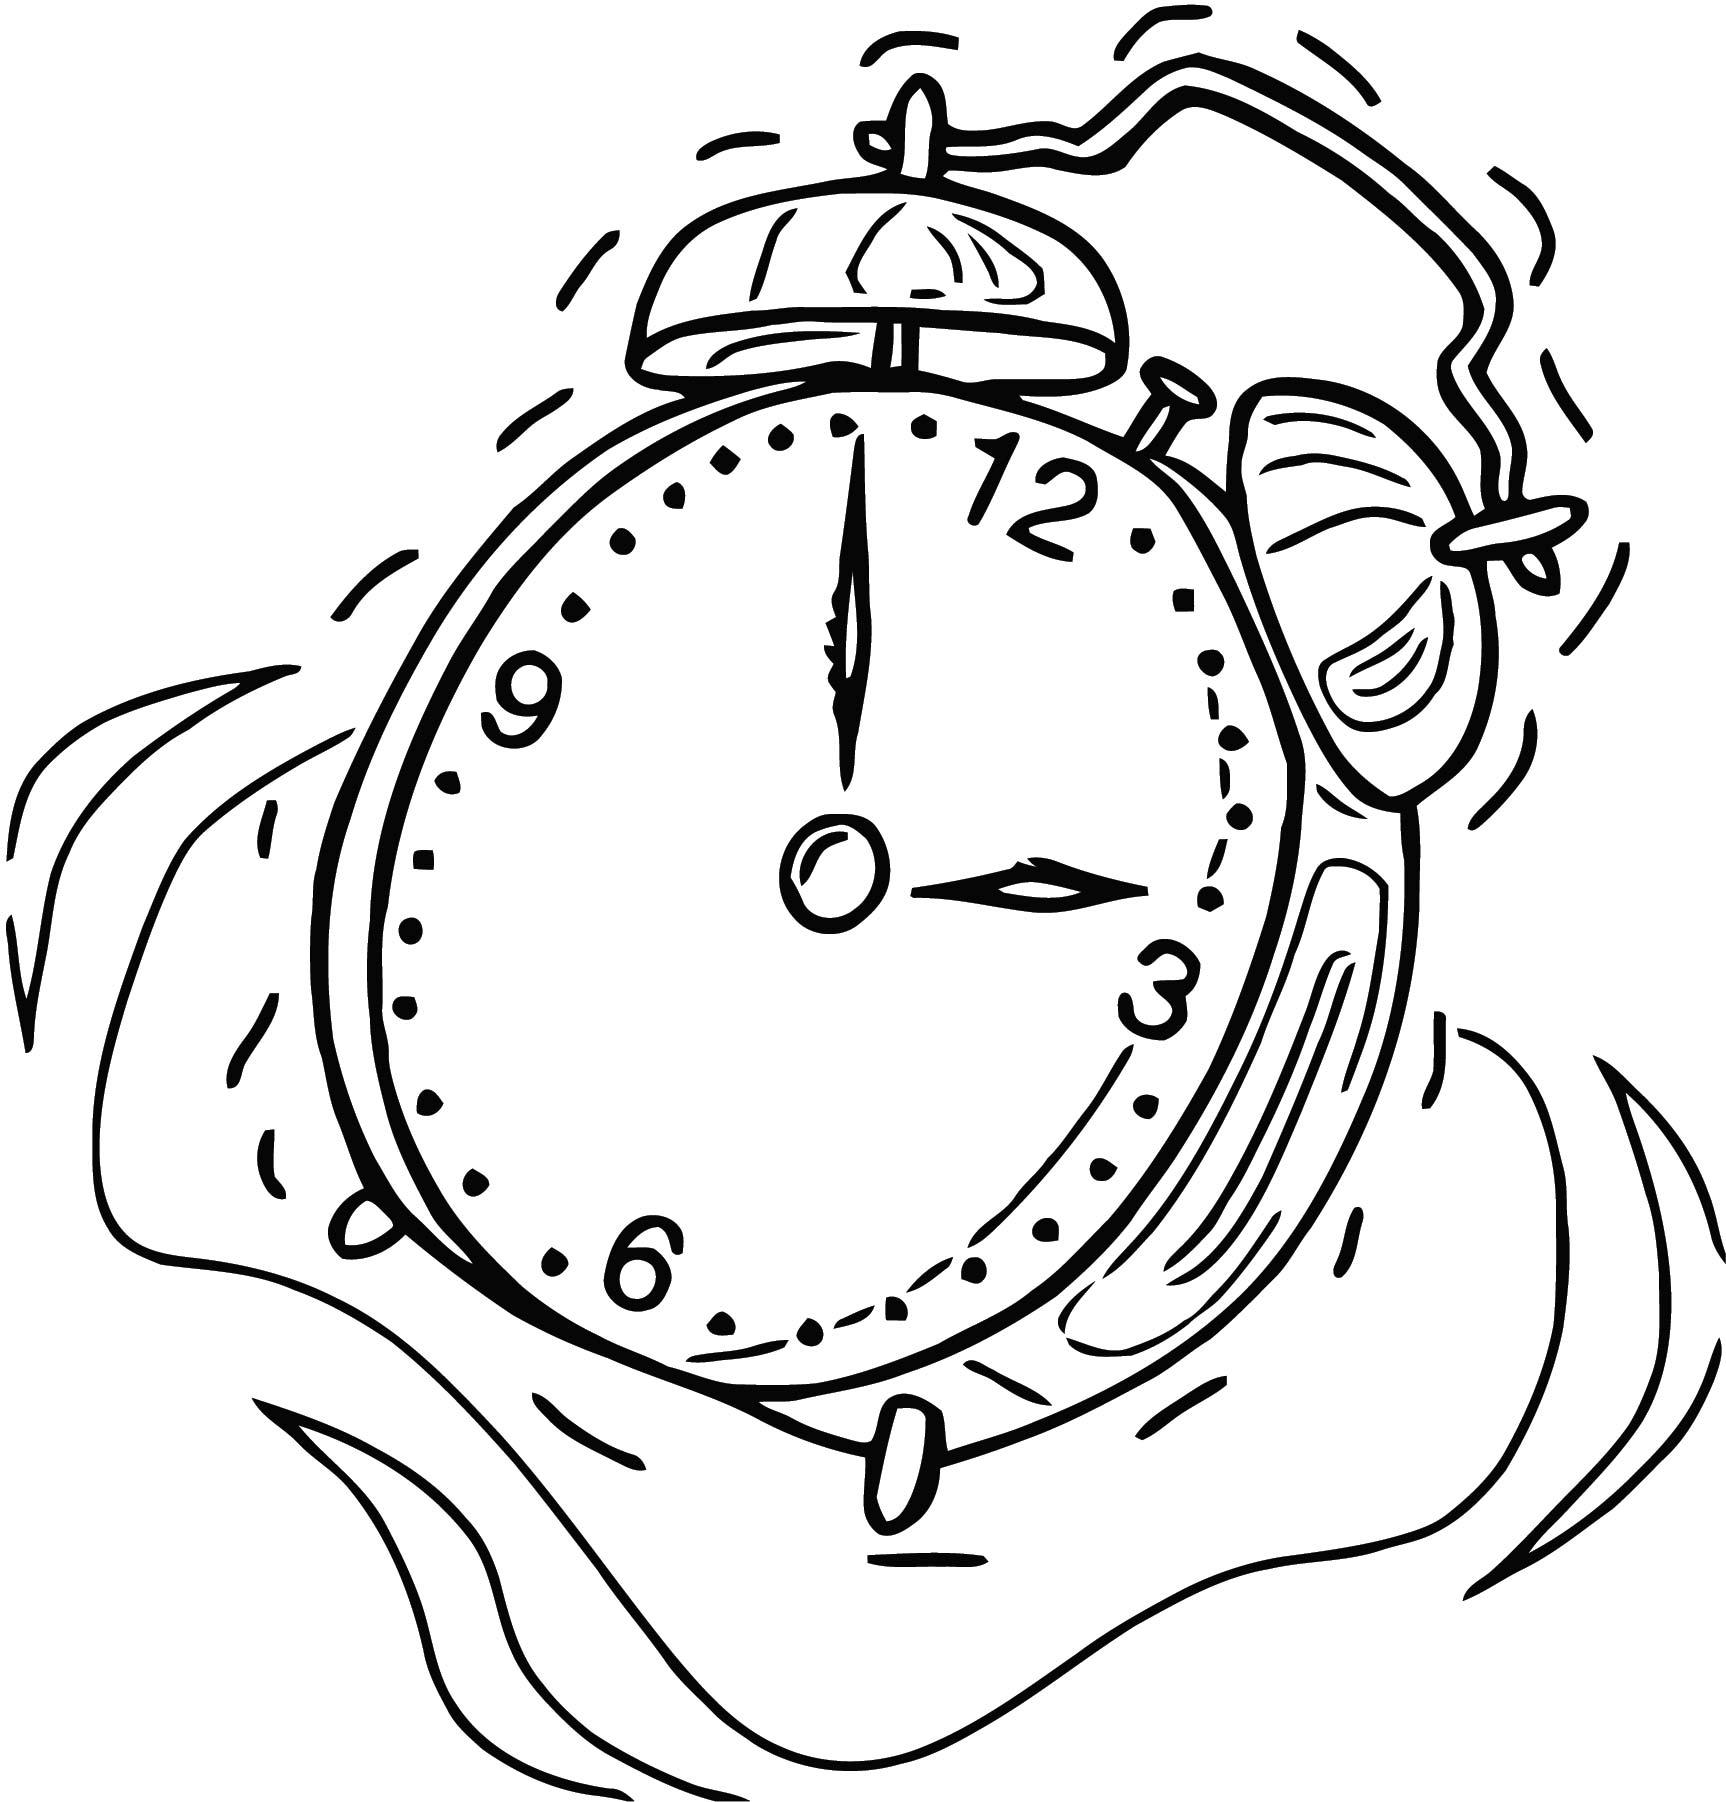 Alarm Clock Free Printable 03 Cartoonized Free Printable Coloring Page